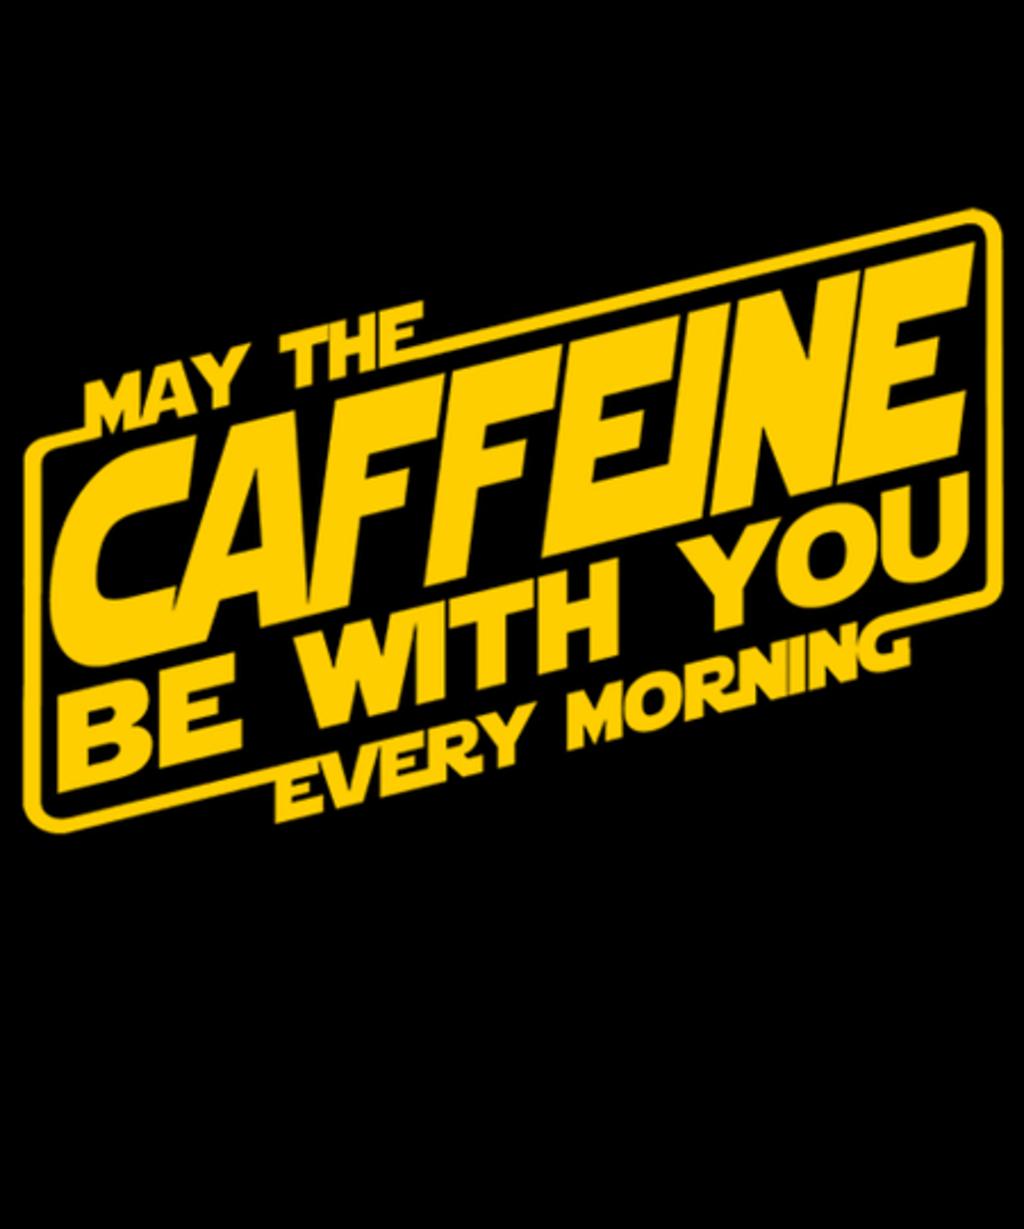 Qwertee: Every Morning